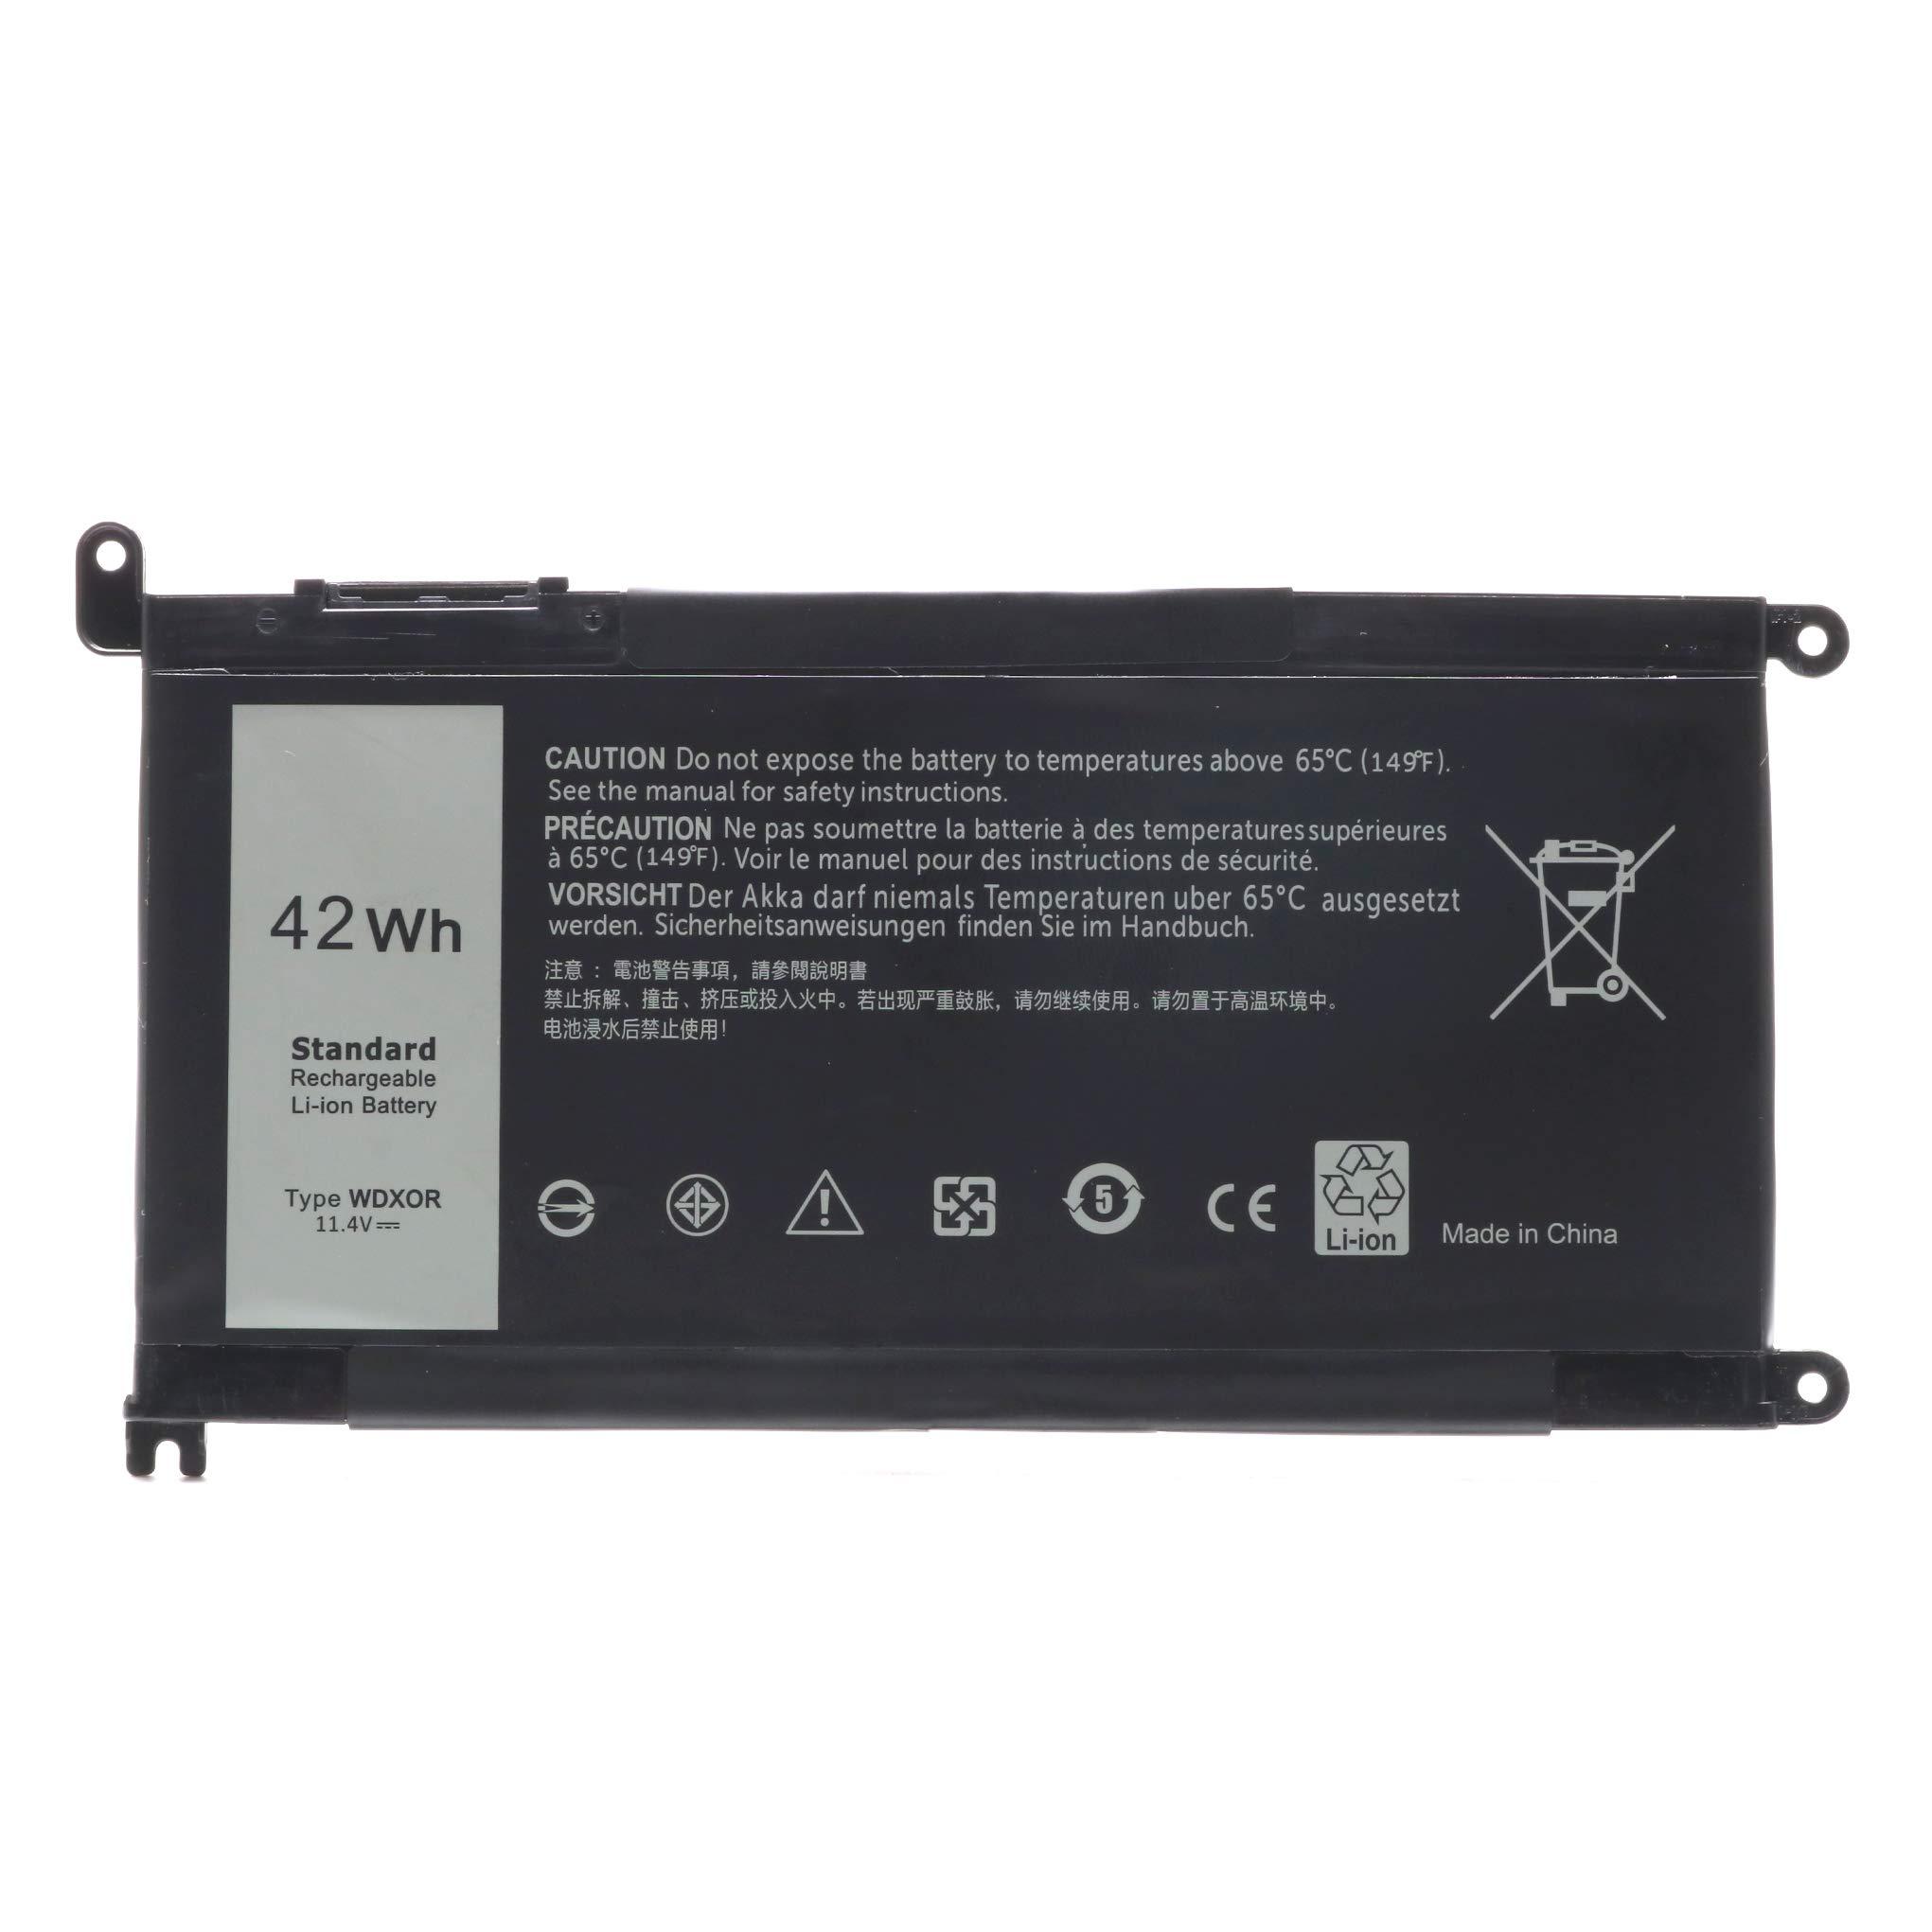 Bateria 42wh Wdxor 11.4v Dell Inspiron 13 7378 13 5000 5378